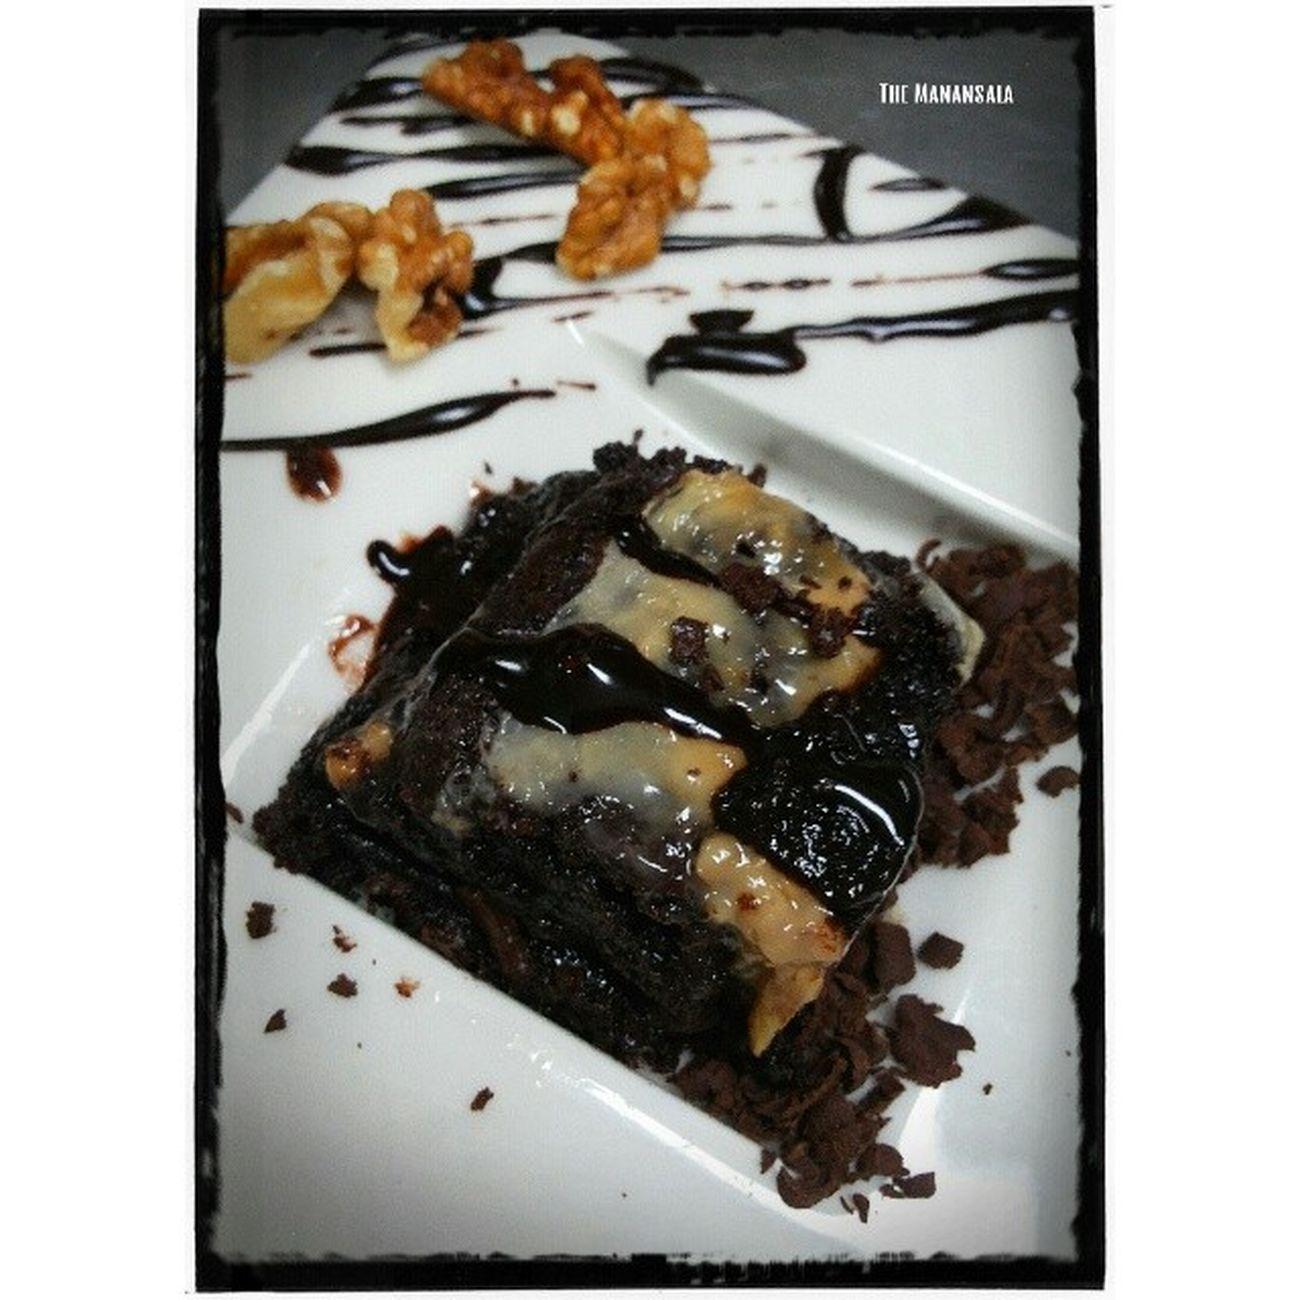 Choco-caramel brownie SugarRush Marketbasket Finale Chemlab foodchemistry foodgasm foodporn gastronomy Benilde themanansala